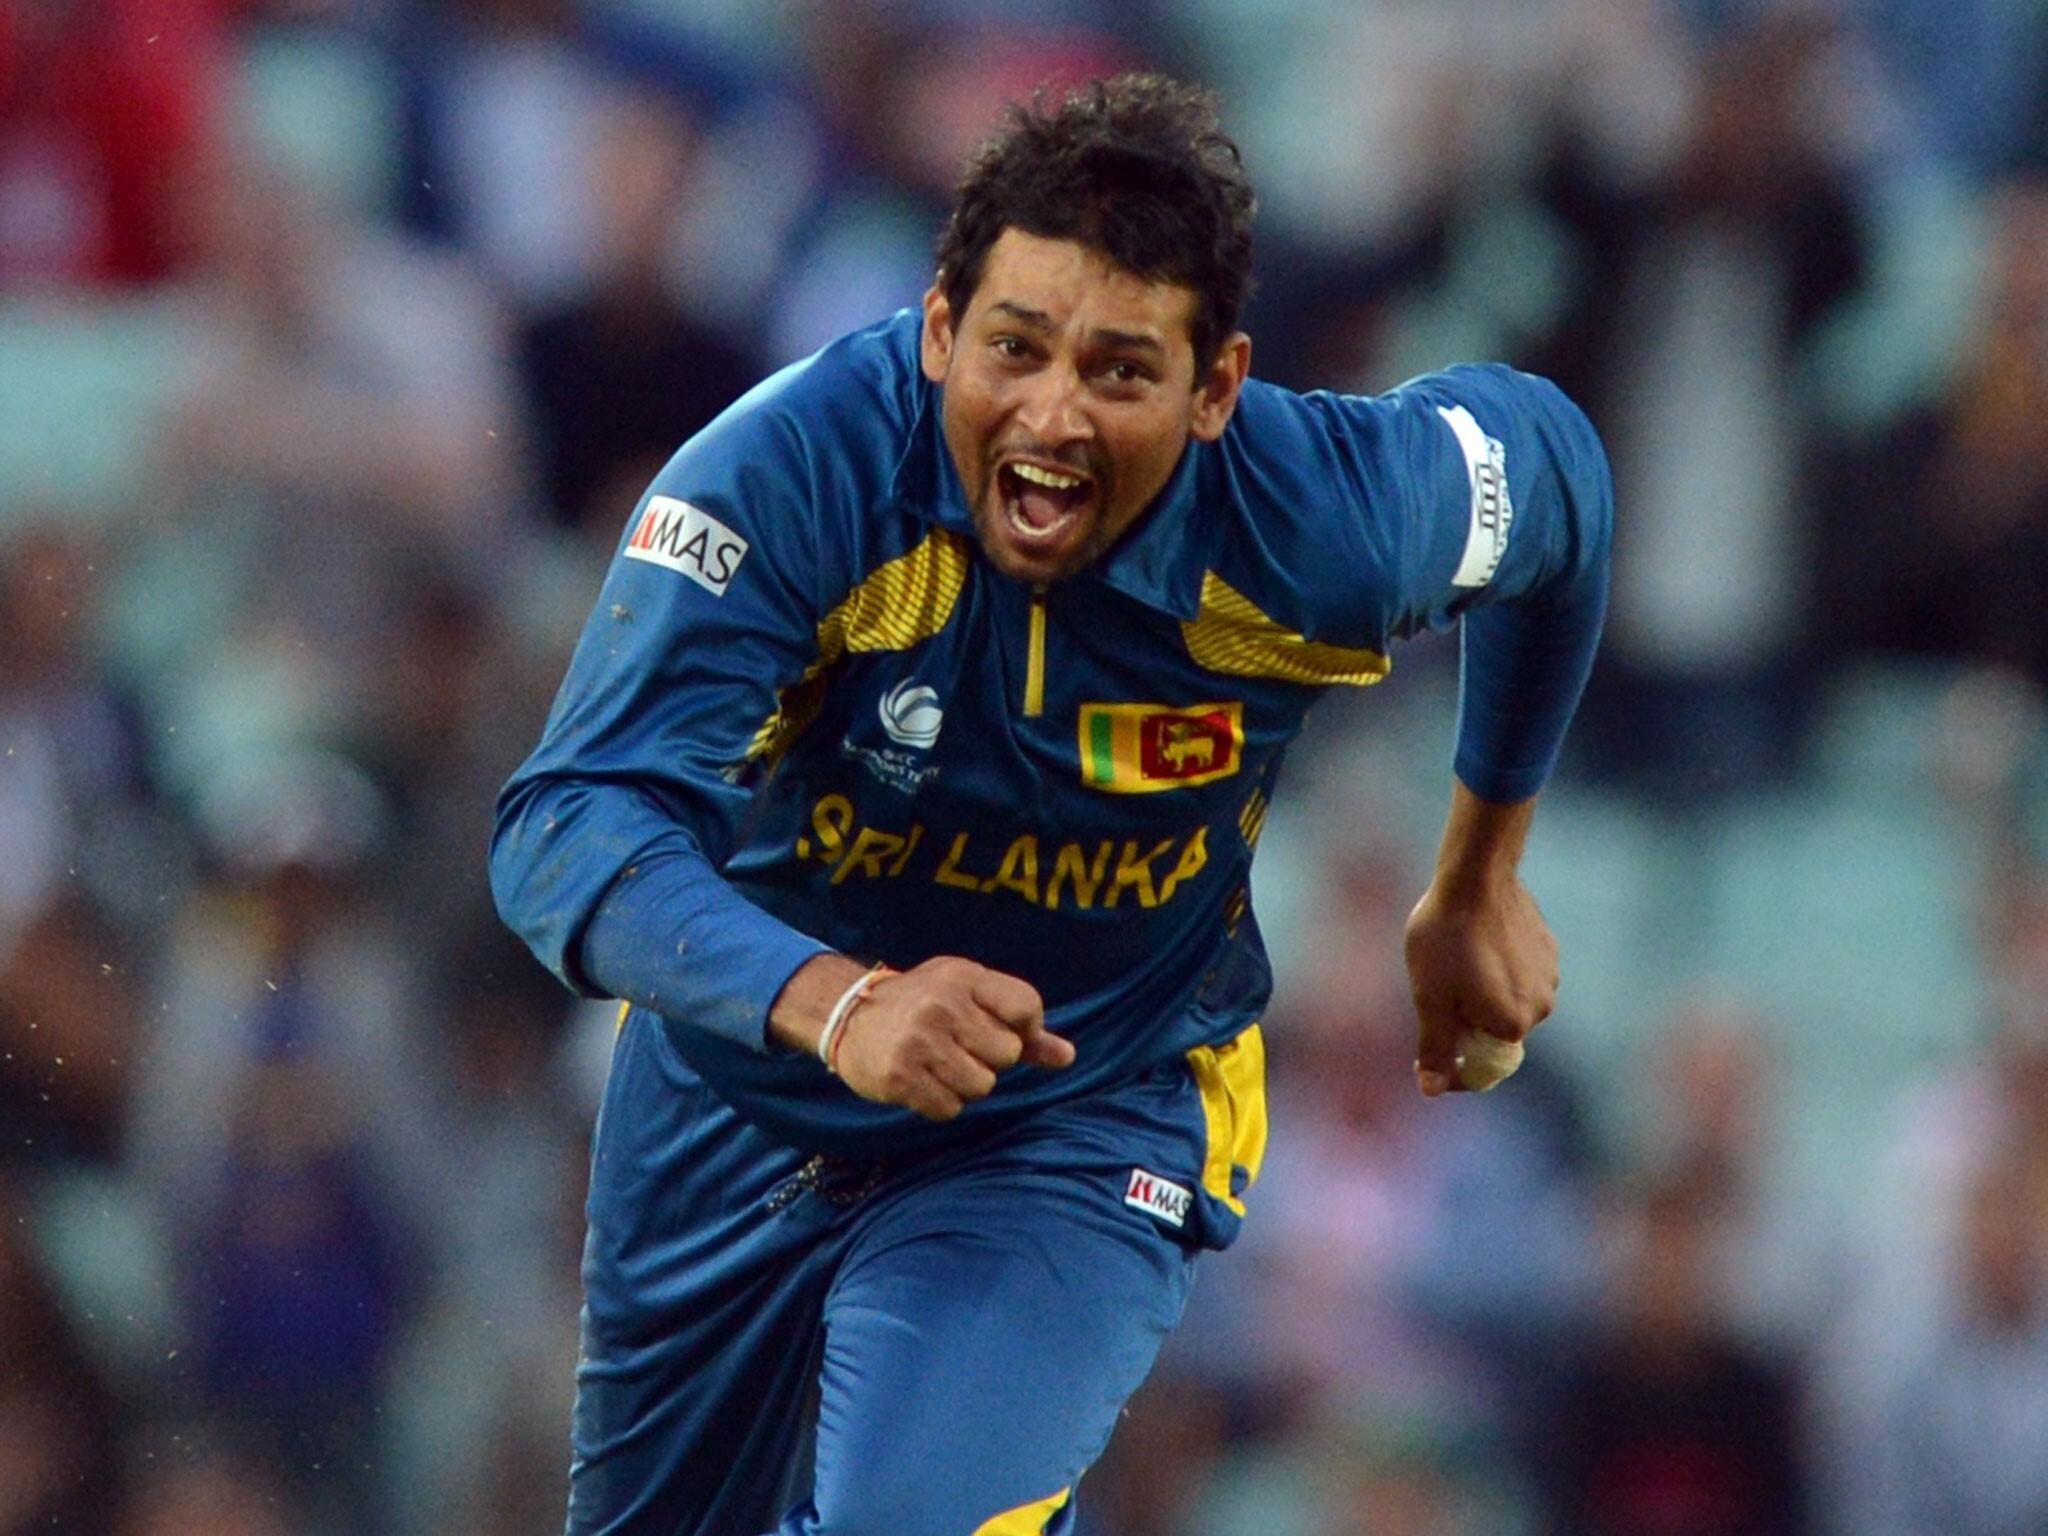 Tillakaratne Dilshan Hiter Batsman Of Sri Lankan Cricket Team